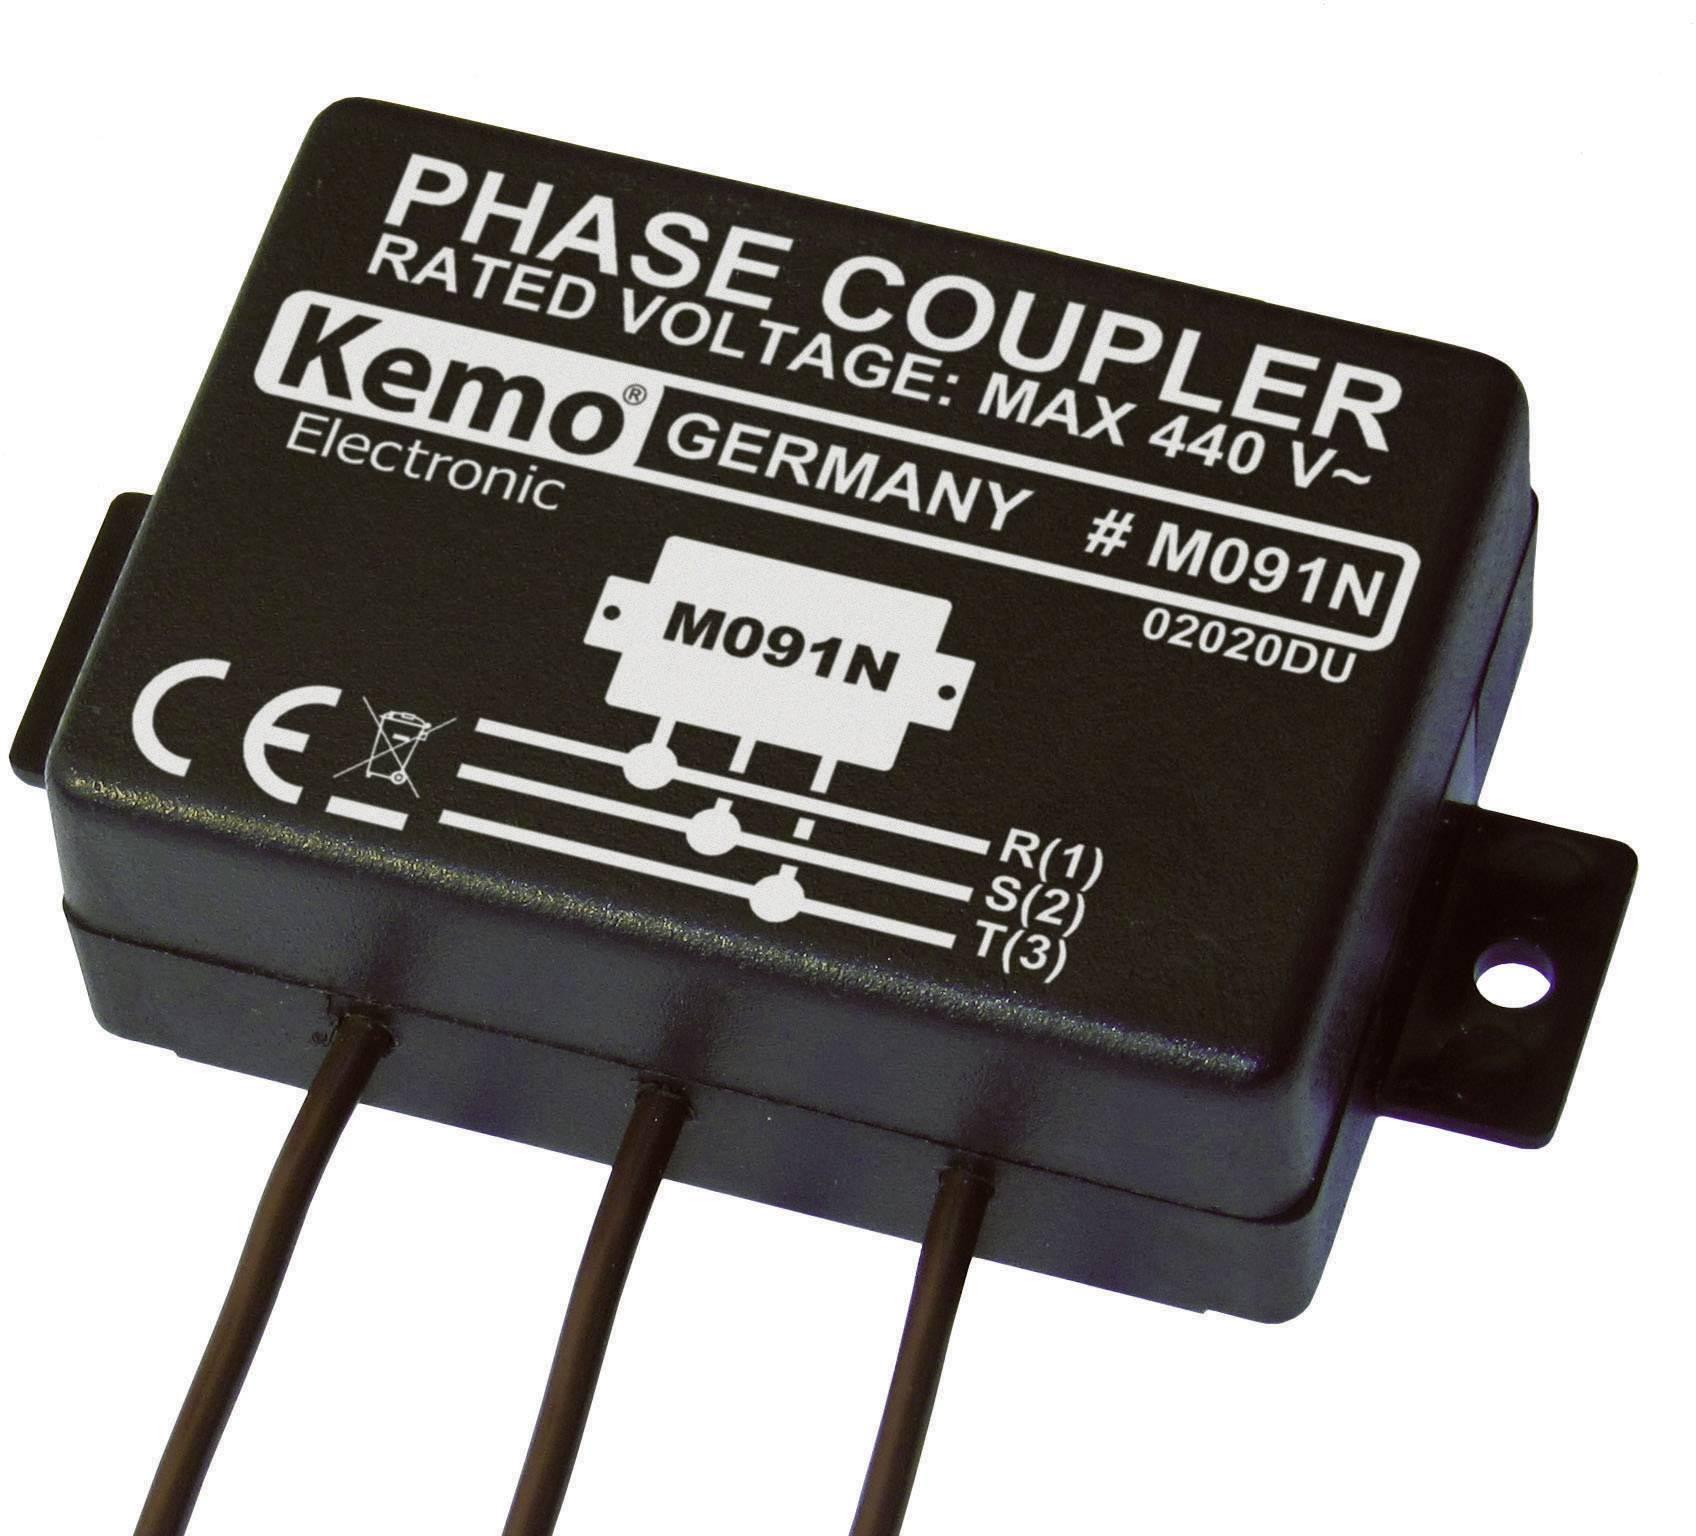 Elektronická fázová spojka pro Powerline produkty Kemo M091N, 110 - 440 V/AC